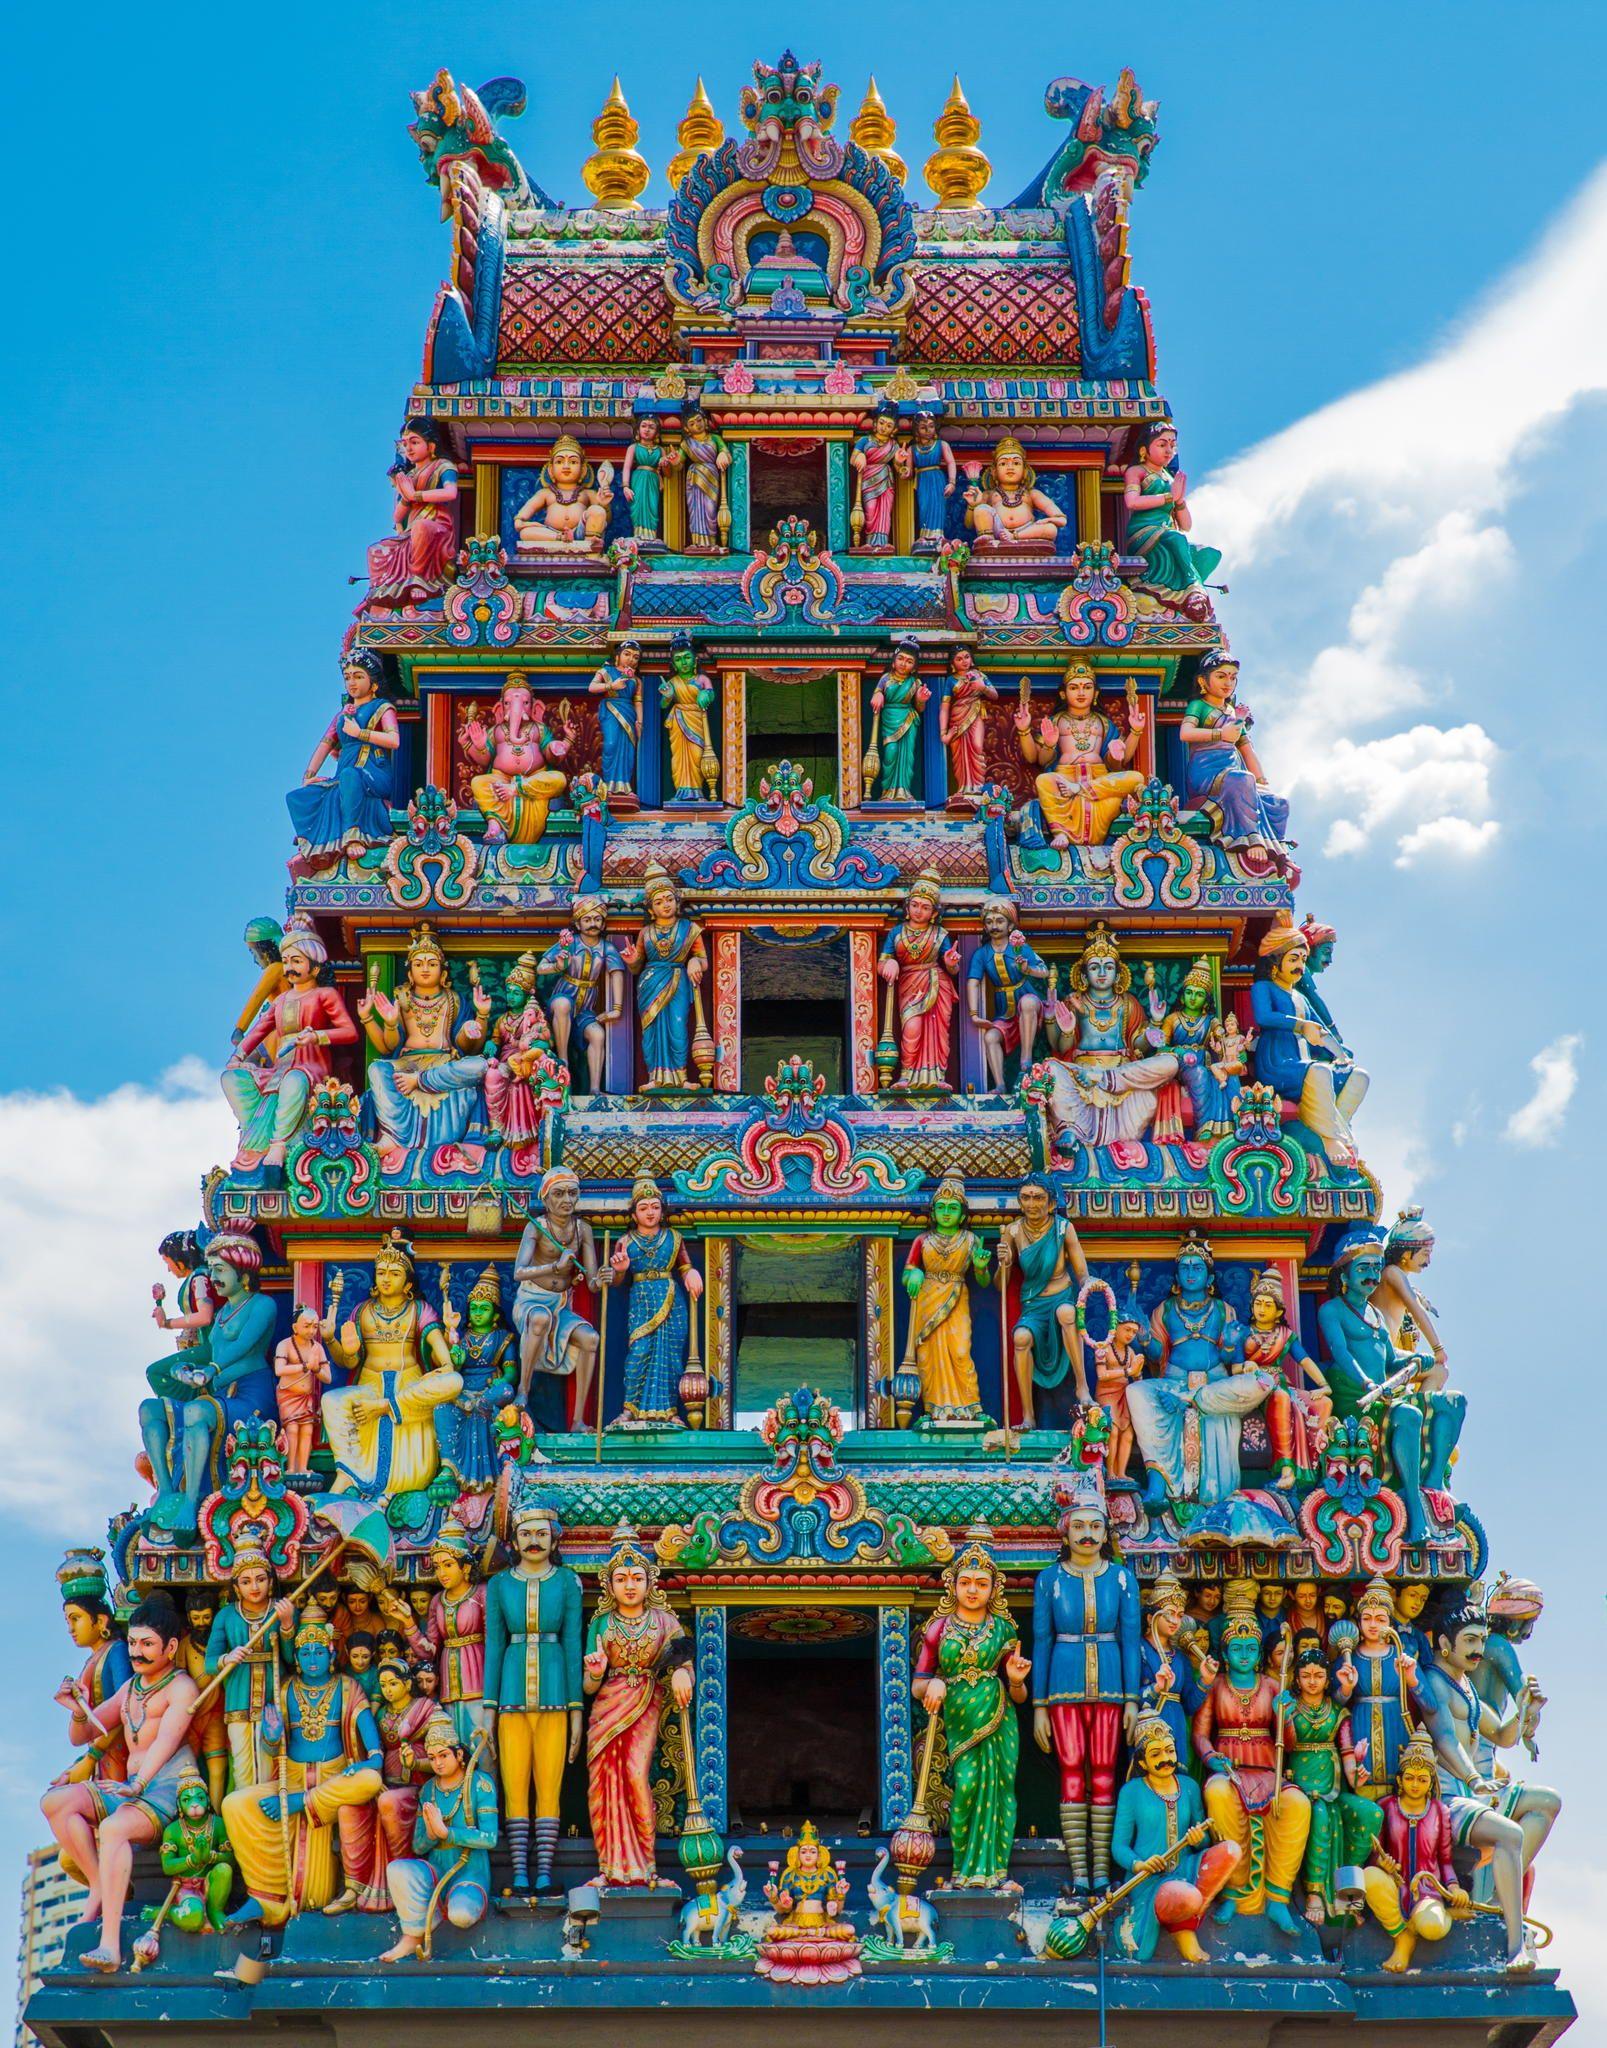 The oldest Hindu temple inSingapore